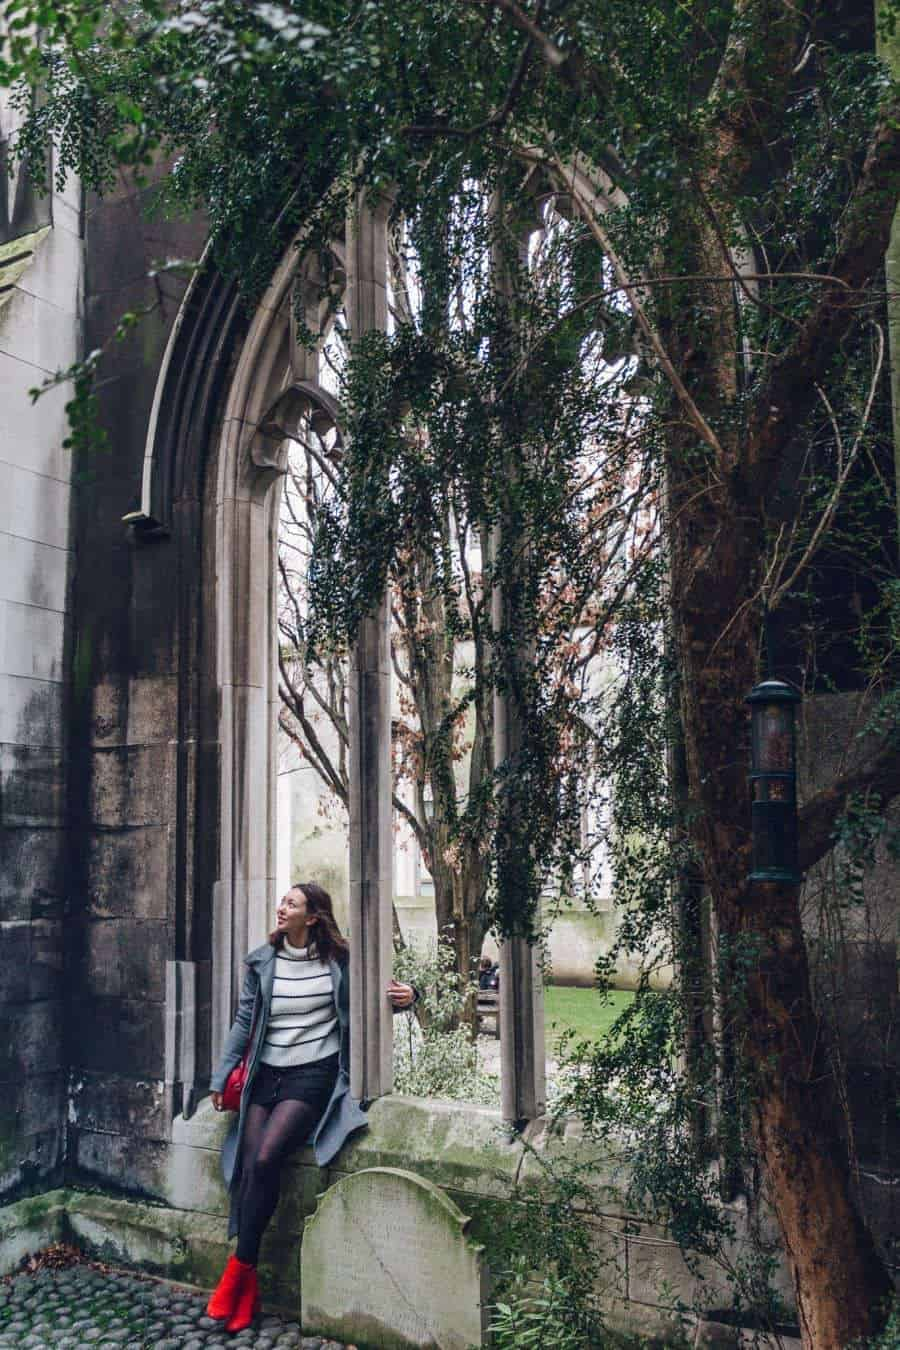 10 Things to Do Near the Sky Garden, London